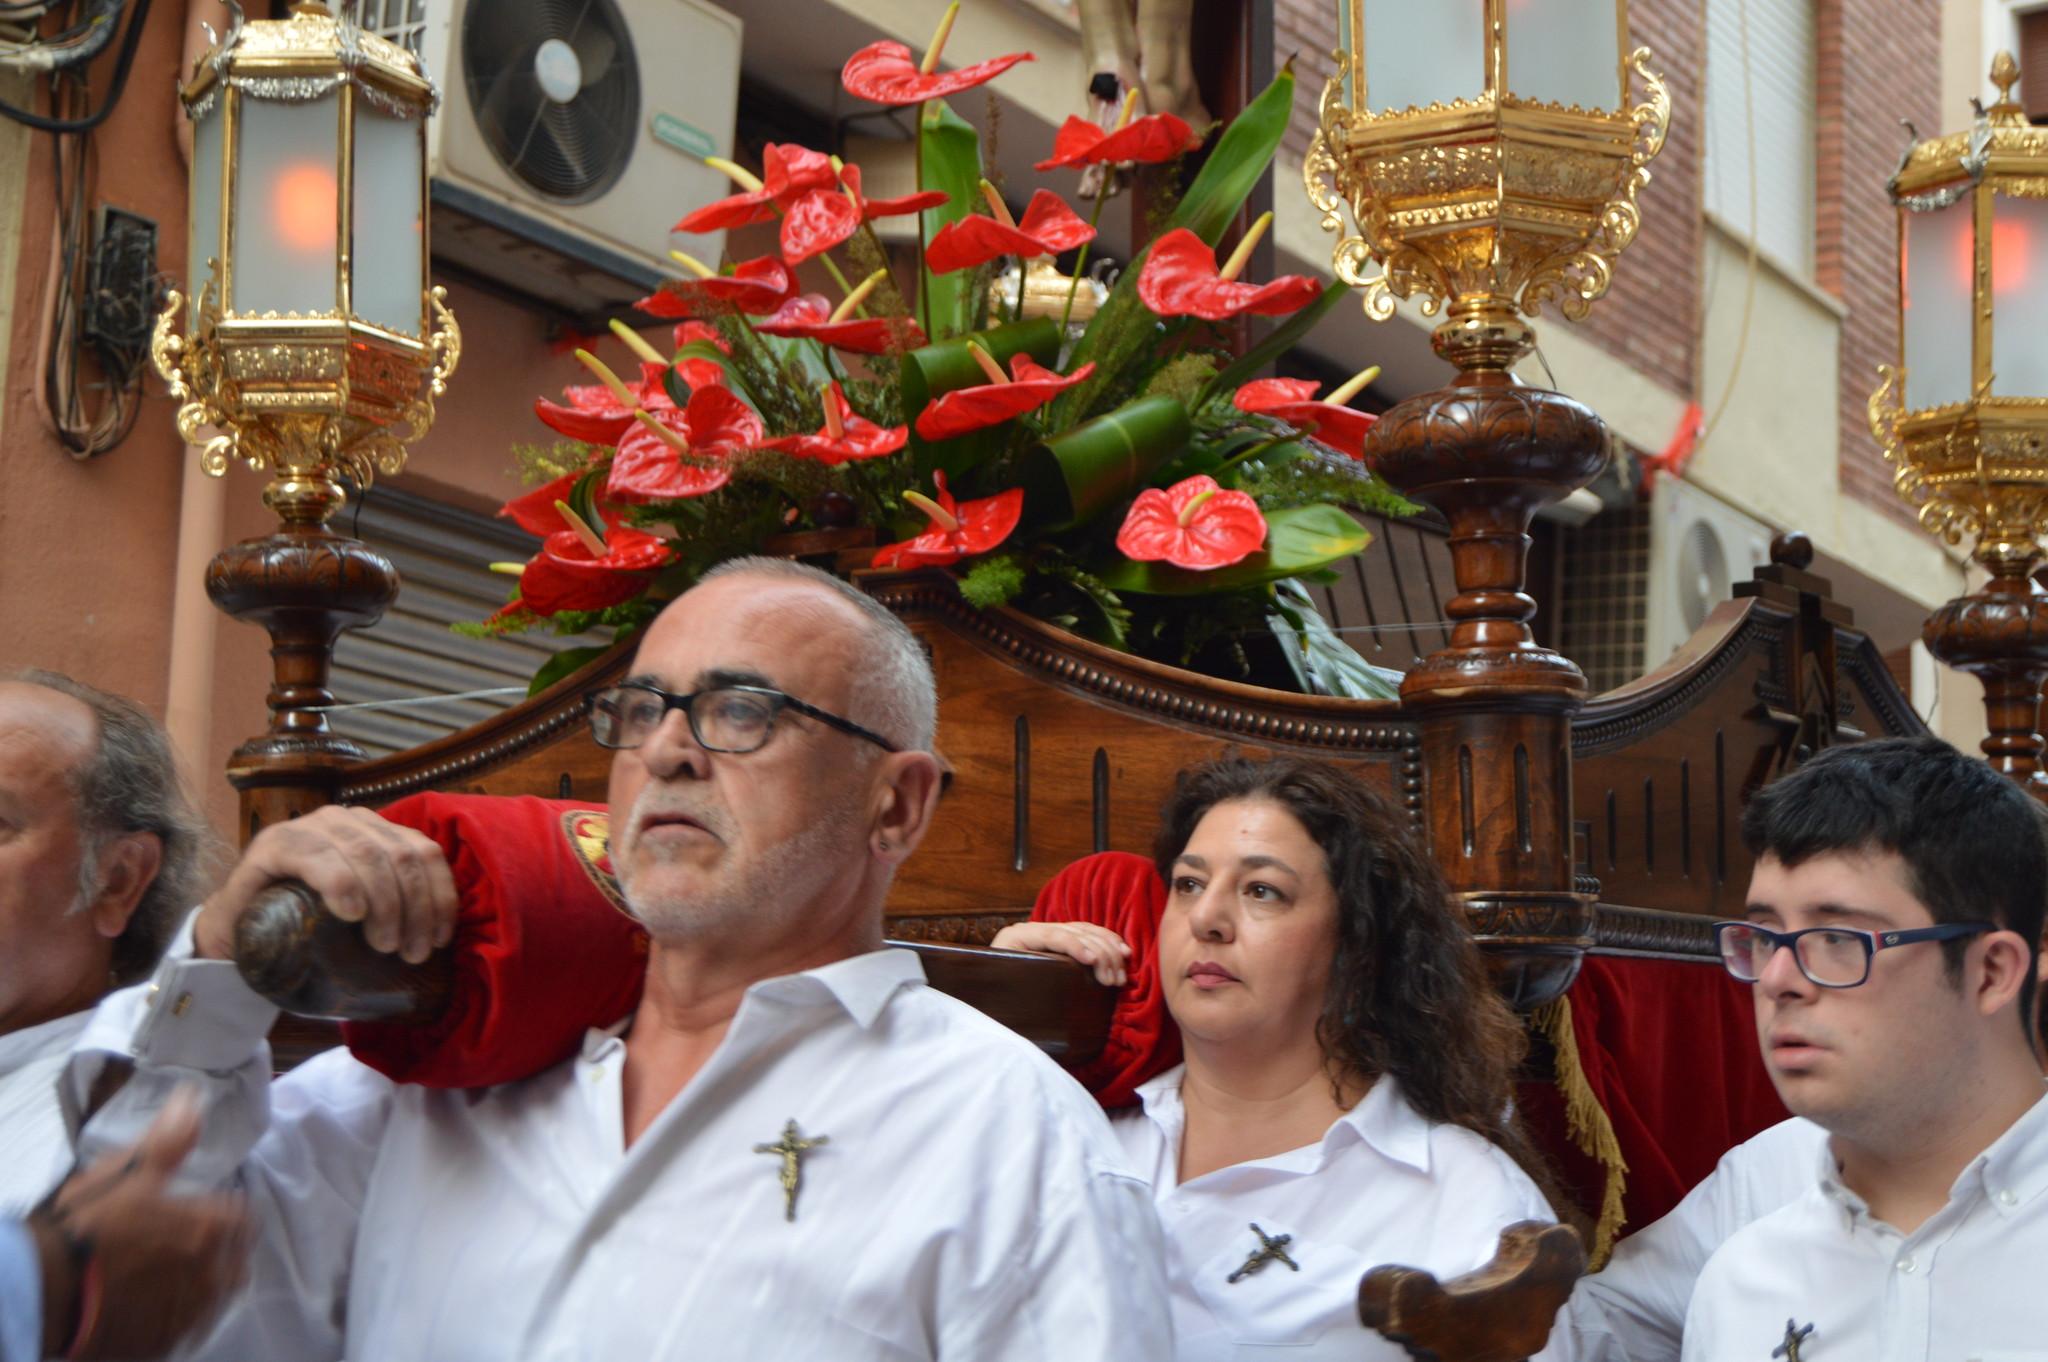 (2019-07-07) Procesión de subida - Adrián Romero Montesinos (11)